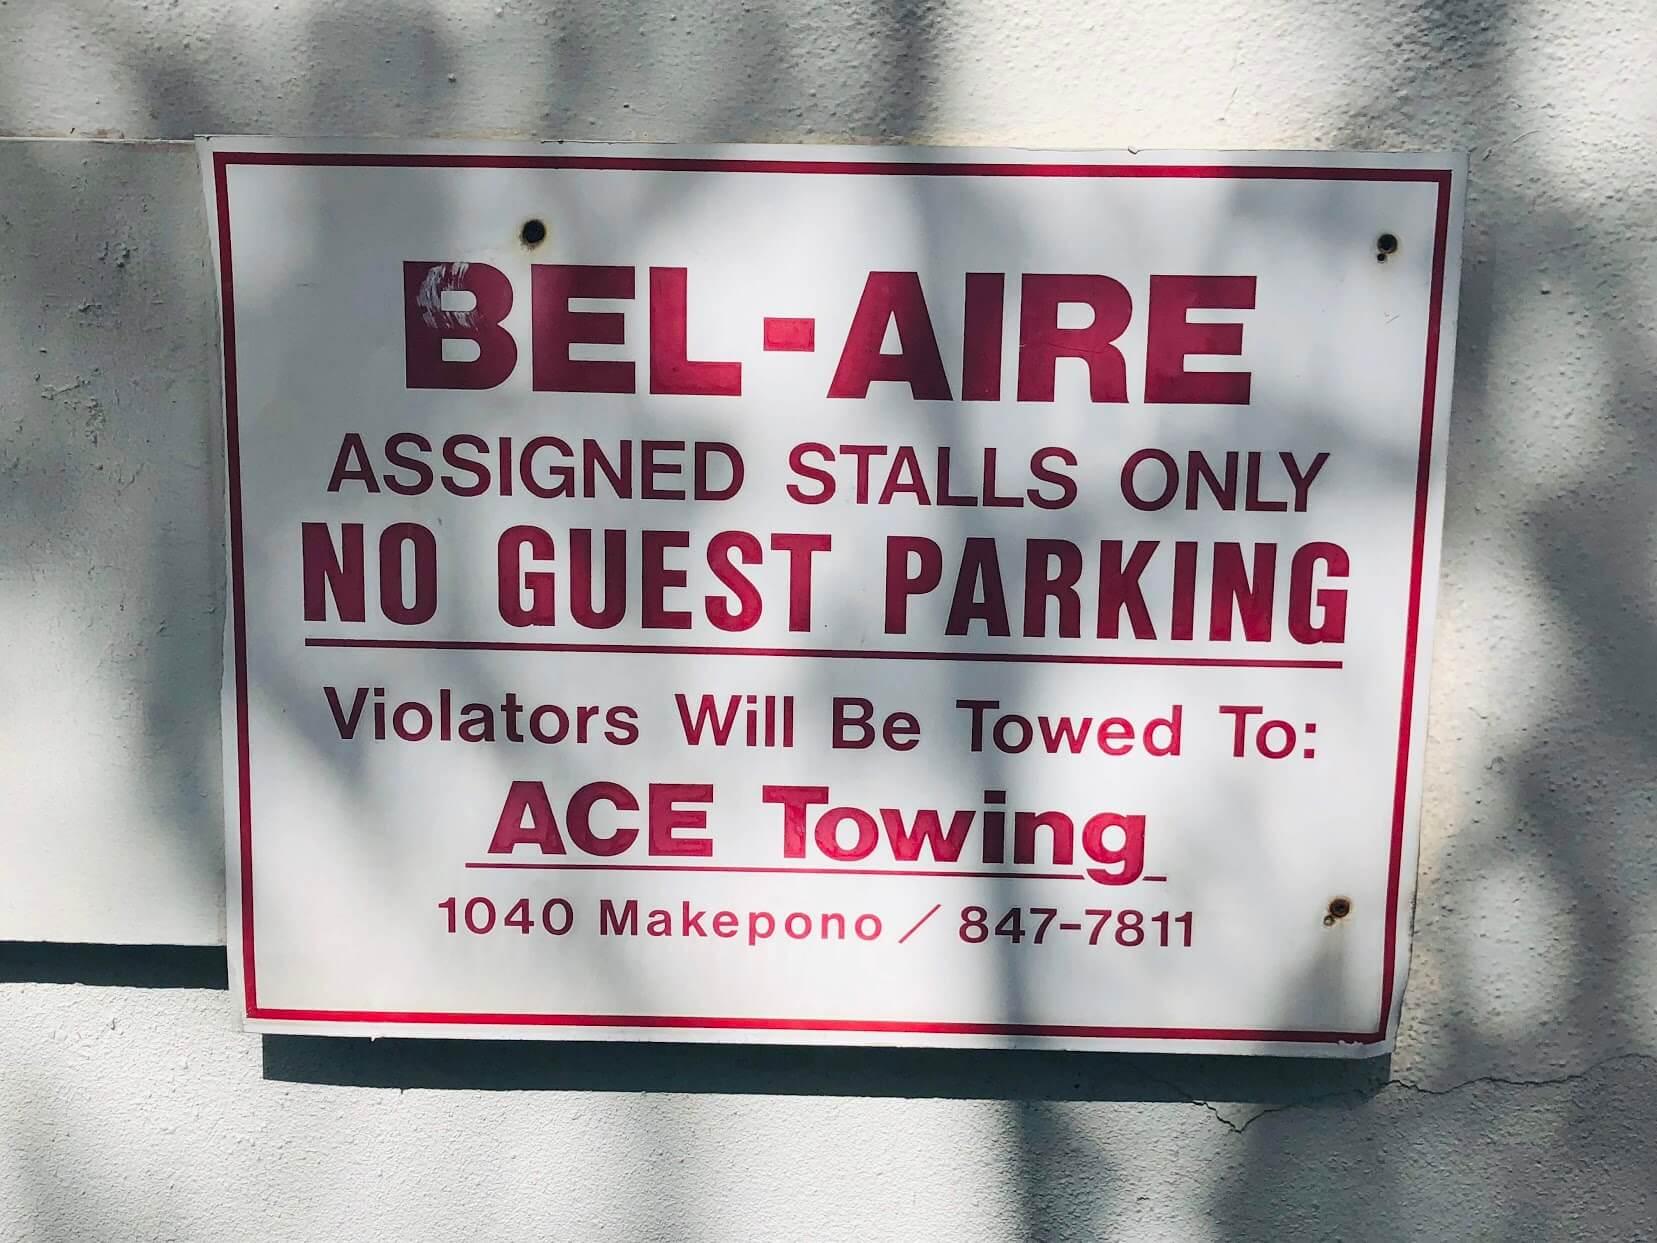 The Bel Aireの注意喚起